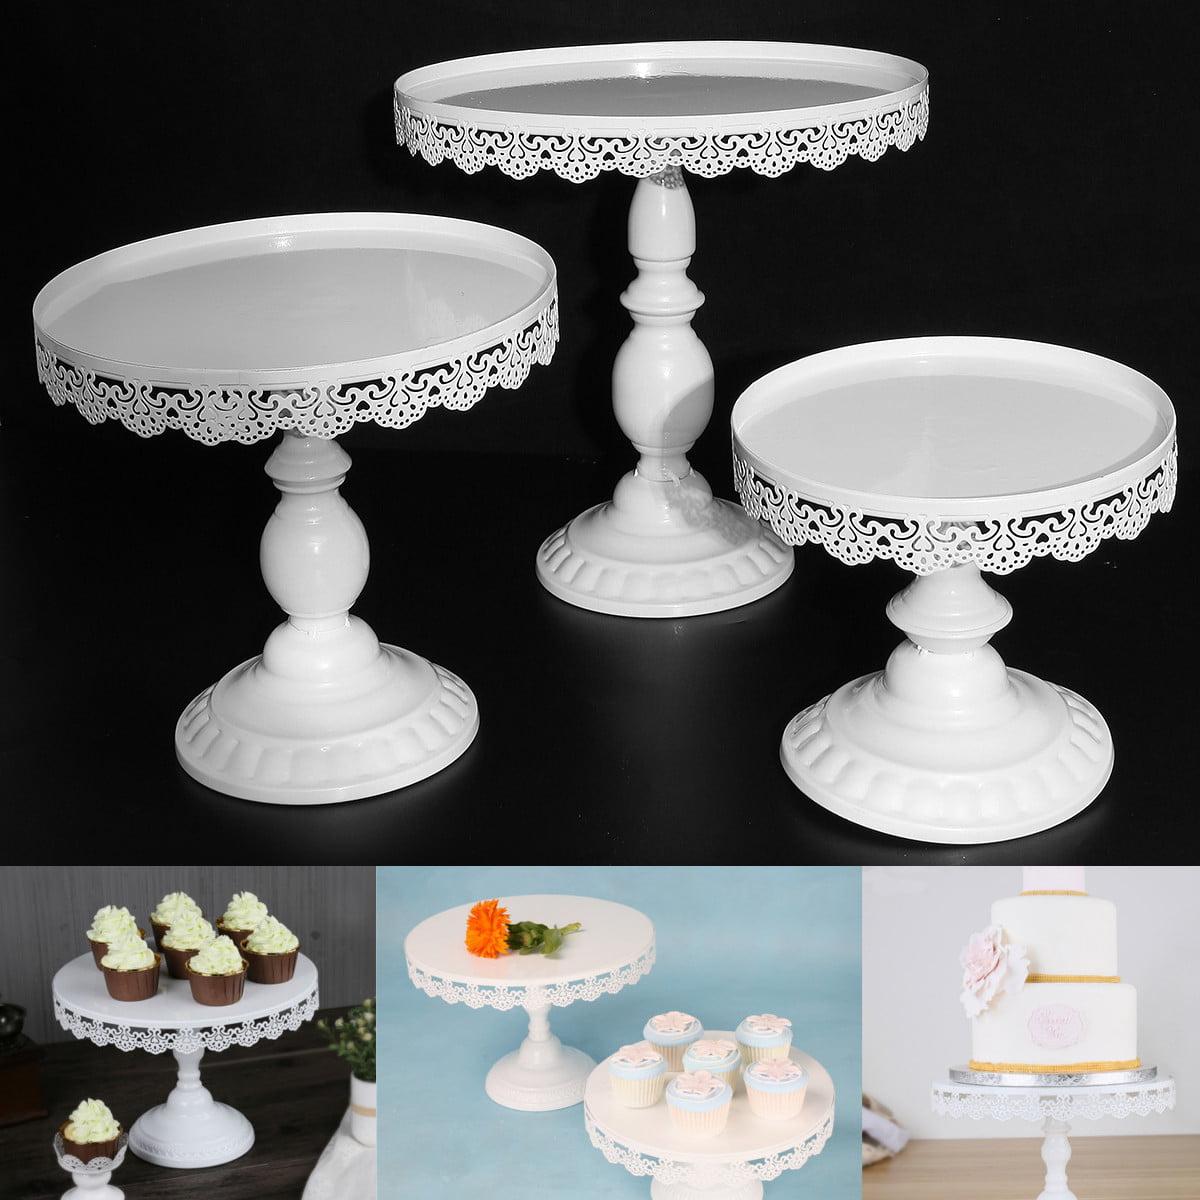 Cake Cupcake Stand Dessert Holder ,Round Metal Wedding Party Fruit Dessert Cupcake Pedestal Display